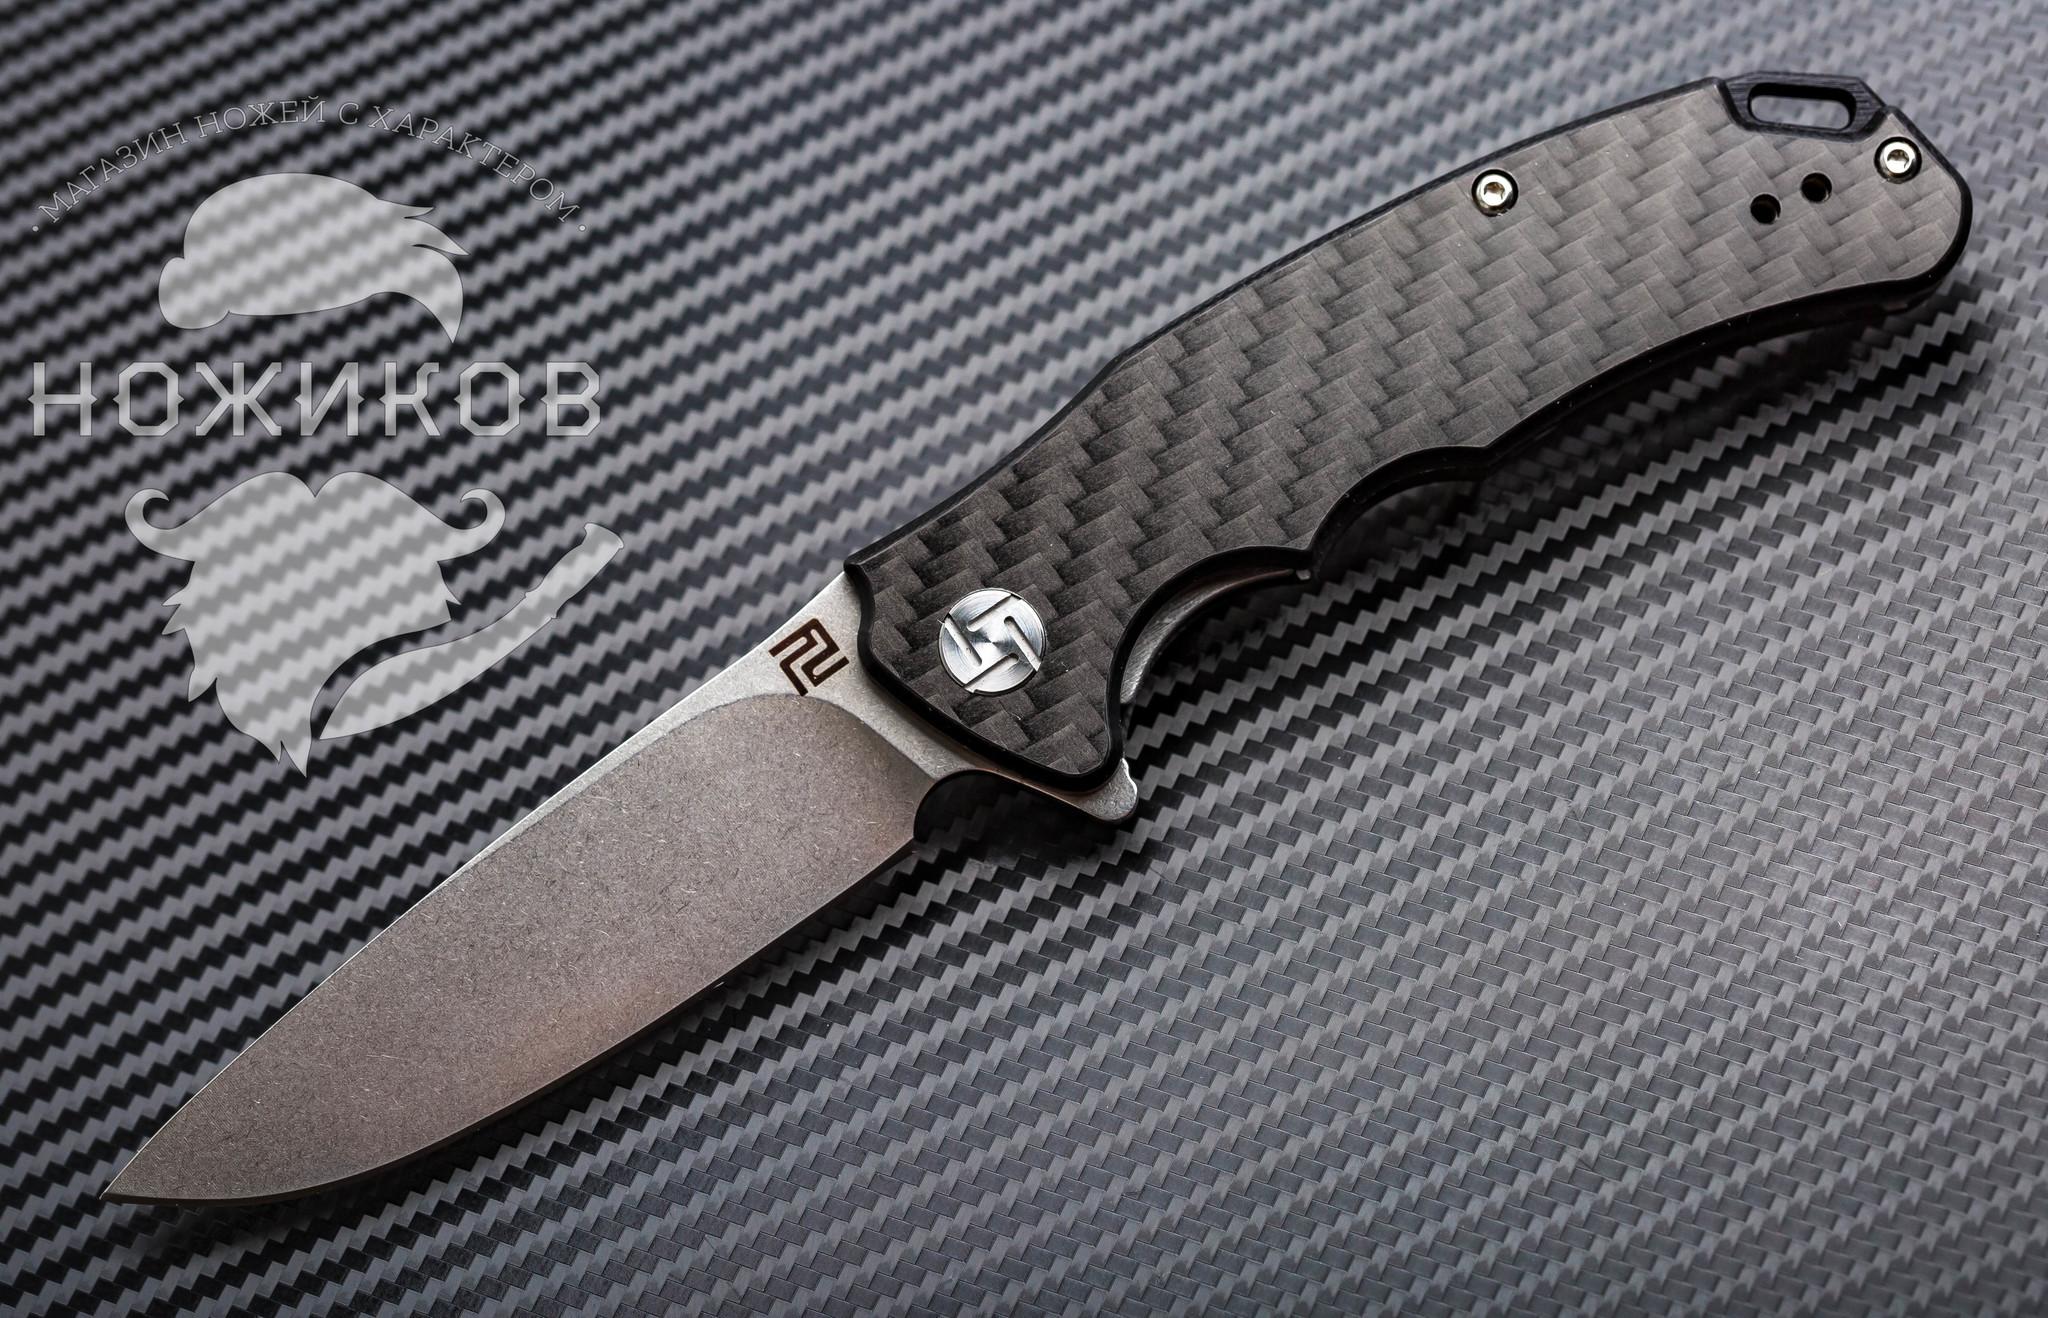 Складной нож Artisan Tradition mini, карбон, сталь D2, G10 нож складной aircraft engineer boker сталь 440а карбон